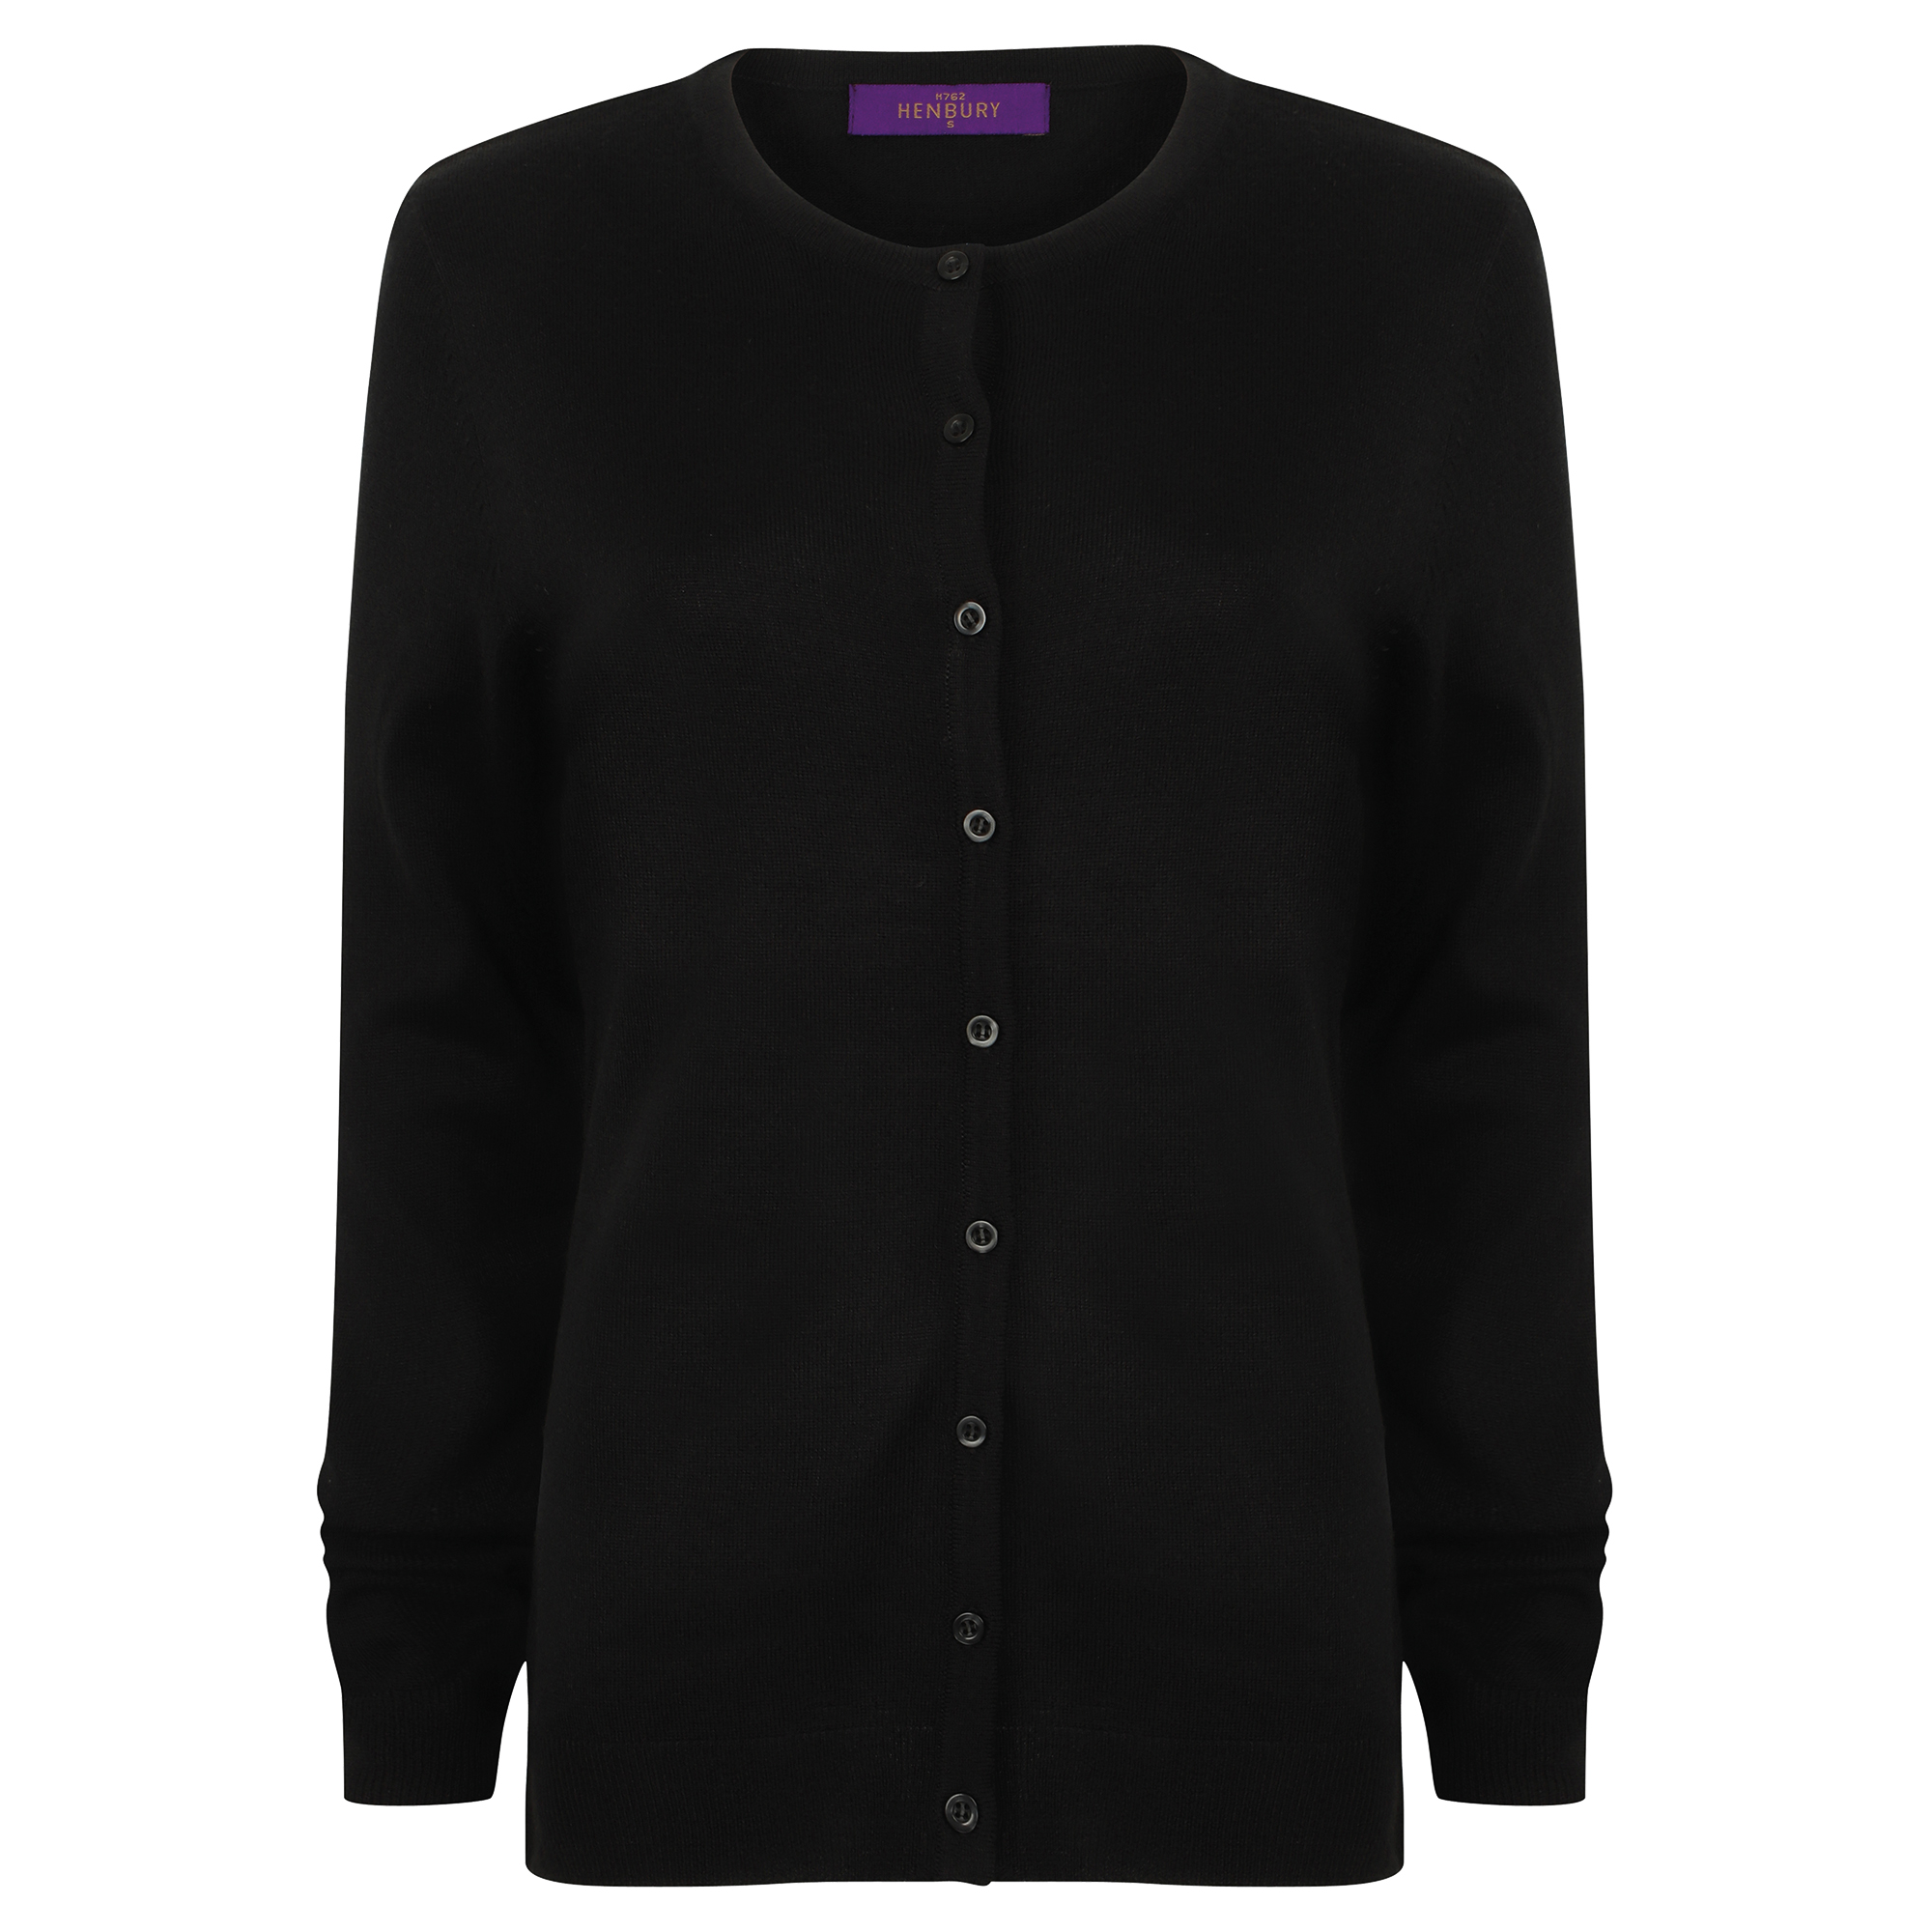 Henbury Womens/Ladies V-Neck Cashmere Touch Button Up Cardigan (2XL) (Black)